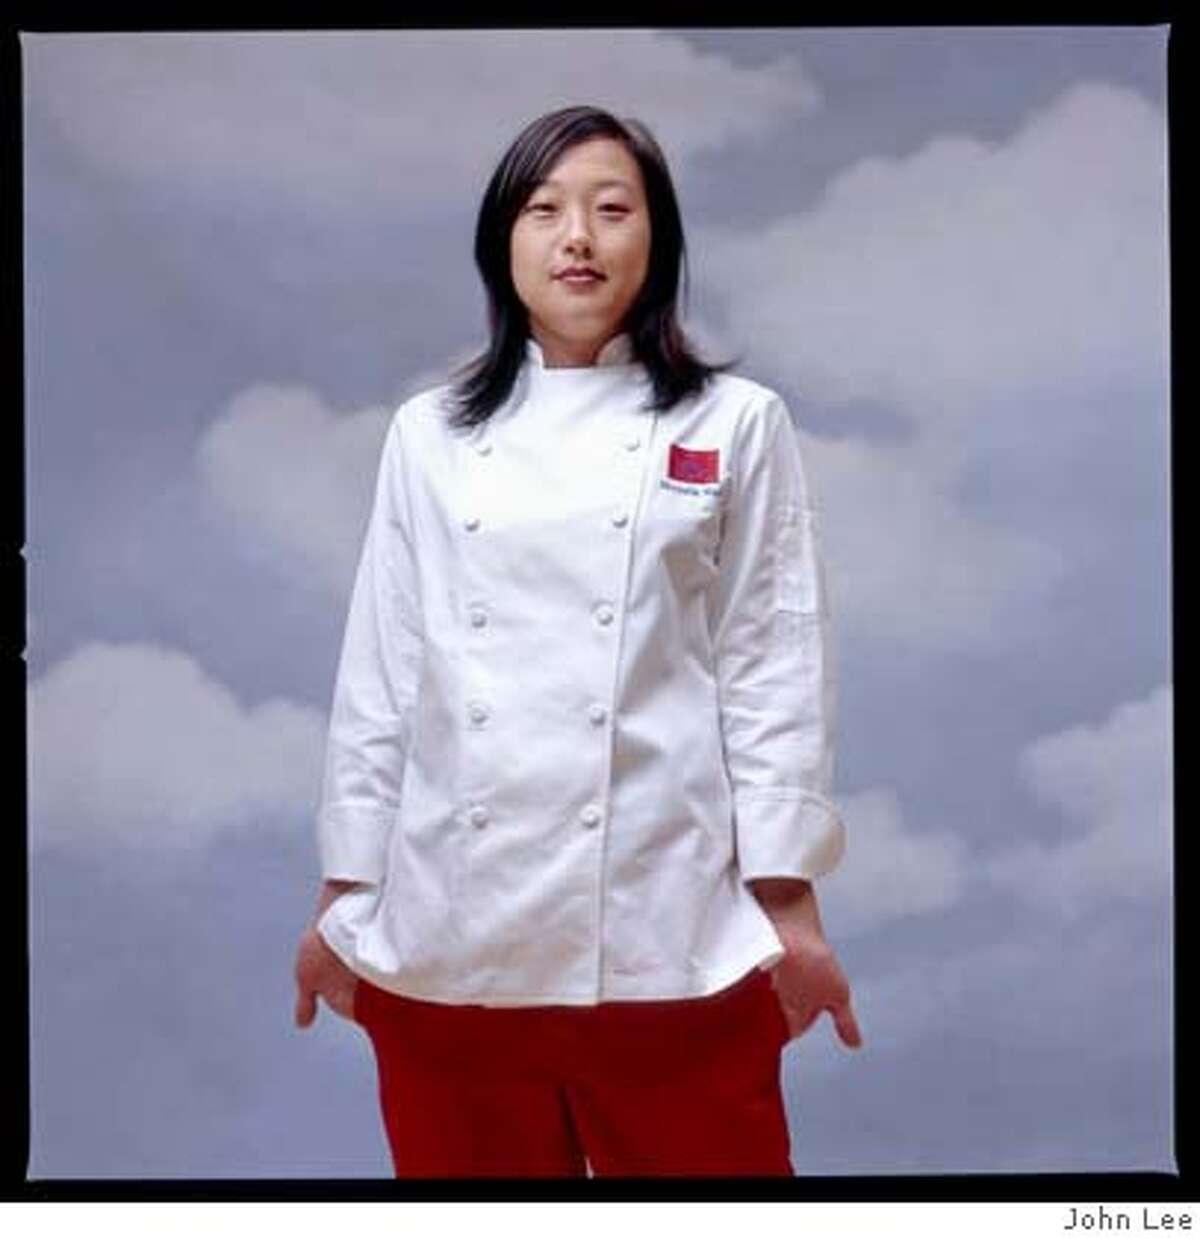 Michelle Mah, Executive Chef at Ponzu. Portrait by John Lee